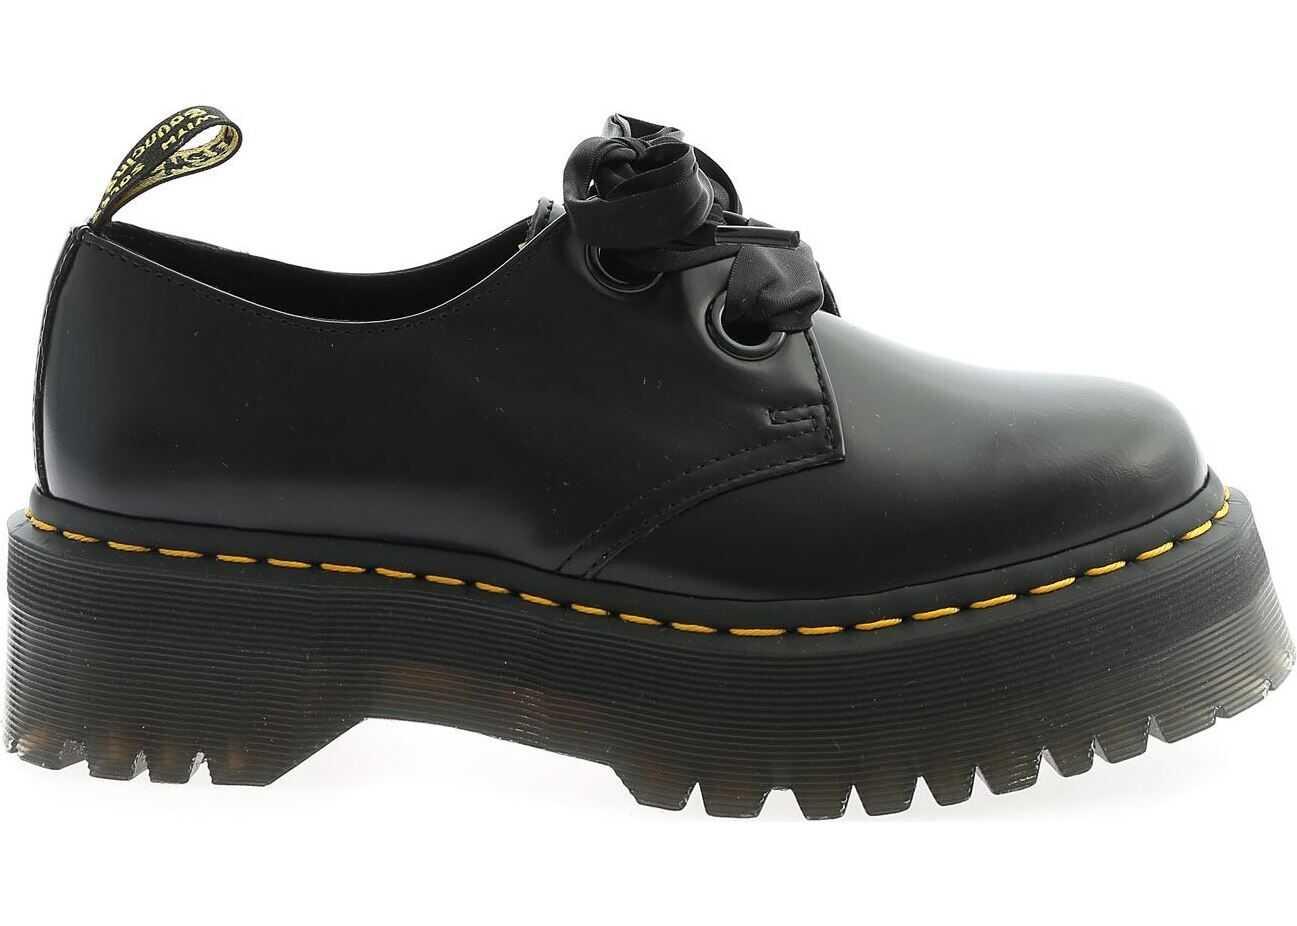 Dr. Martens Holly Derby Shoes In Black Black